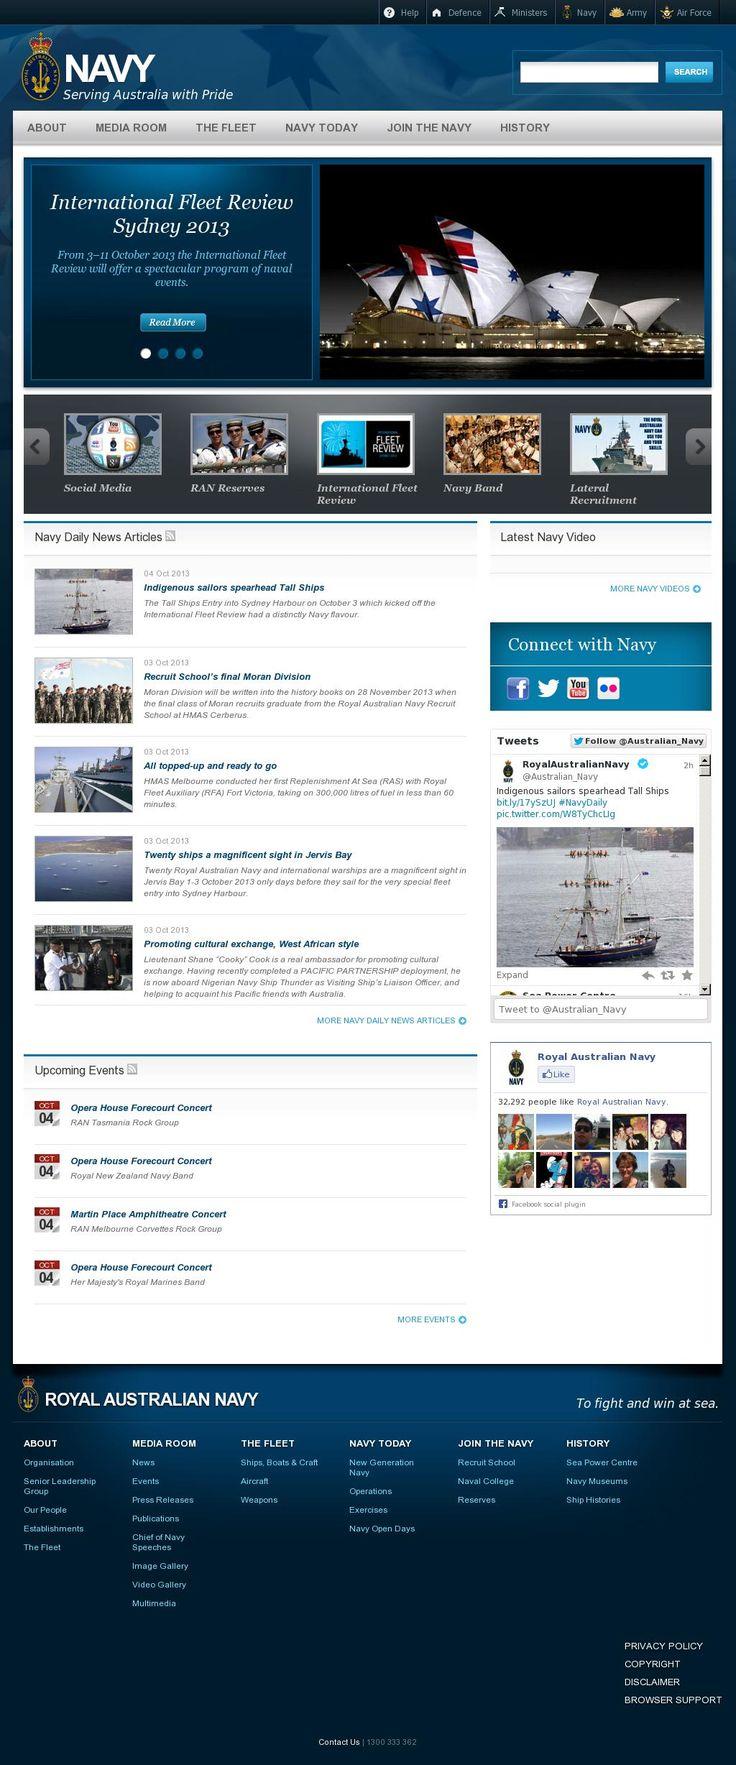 The website 'http://www.navy.gov.au/' courtesy of @Pinstamatic (http://pinstamatic.com)